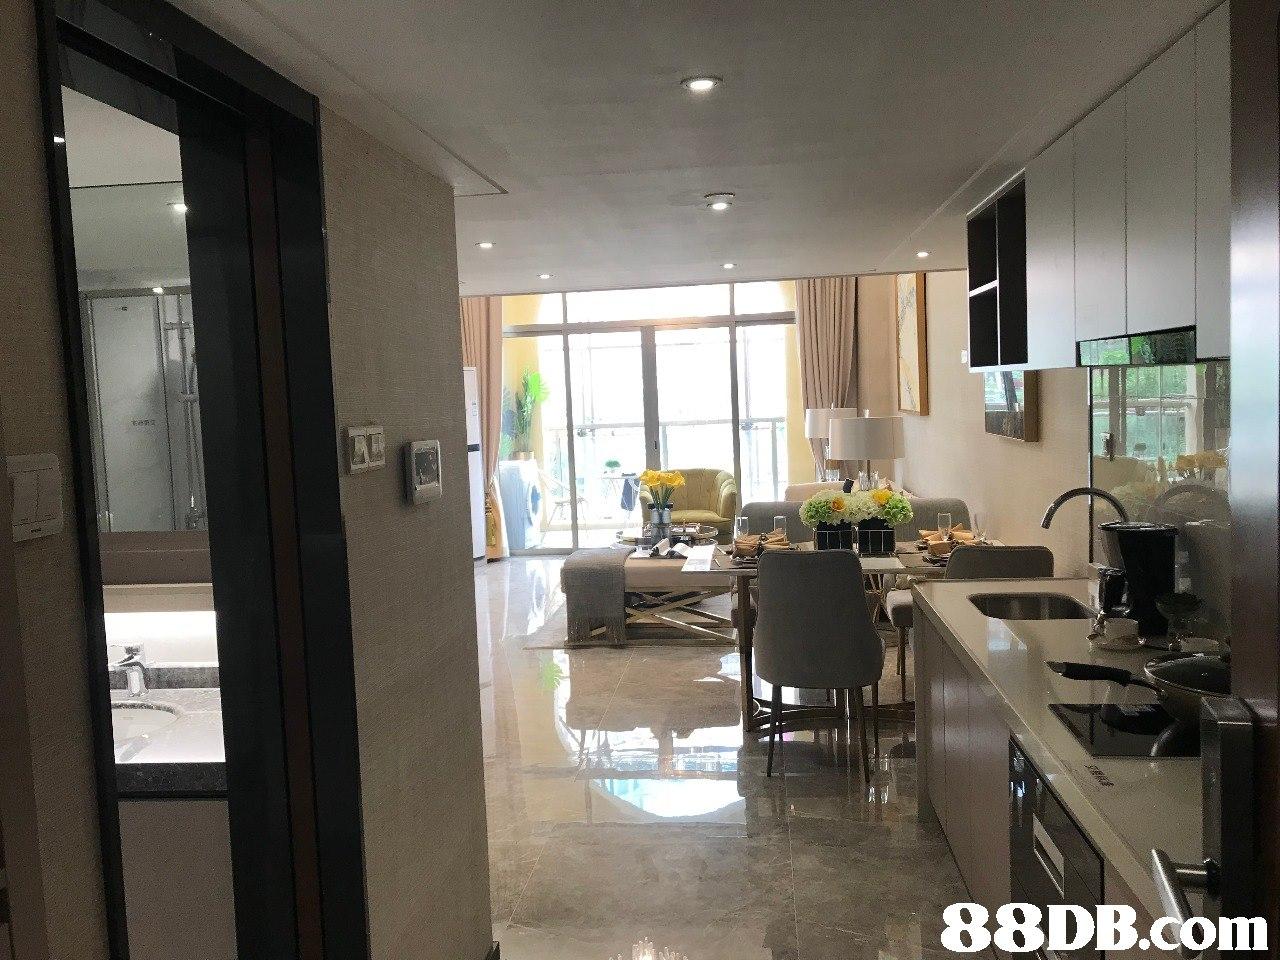 Property,Room,Building,Interior design,Ceiling